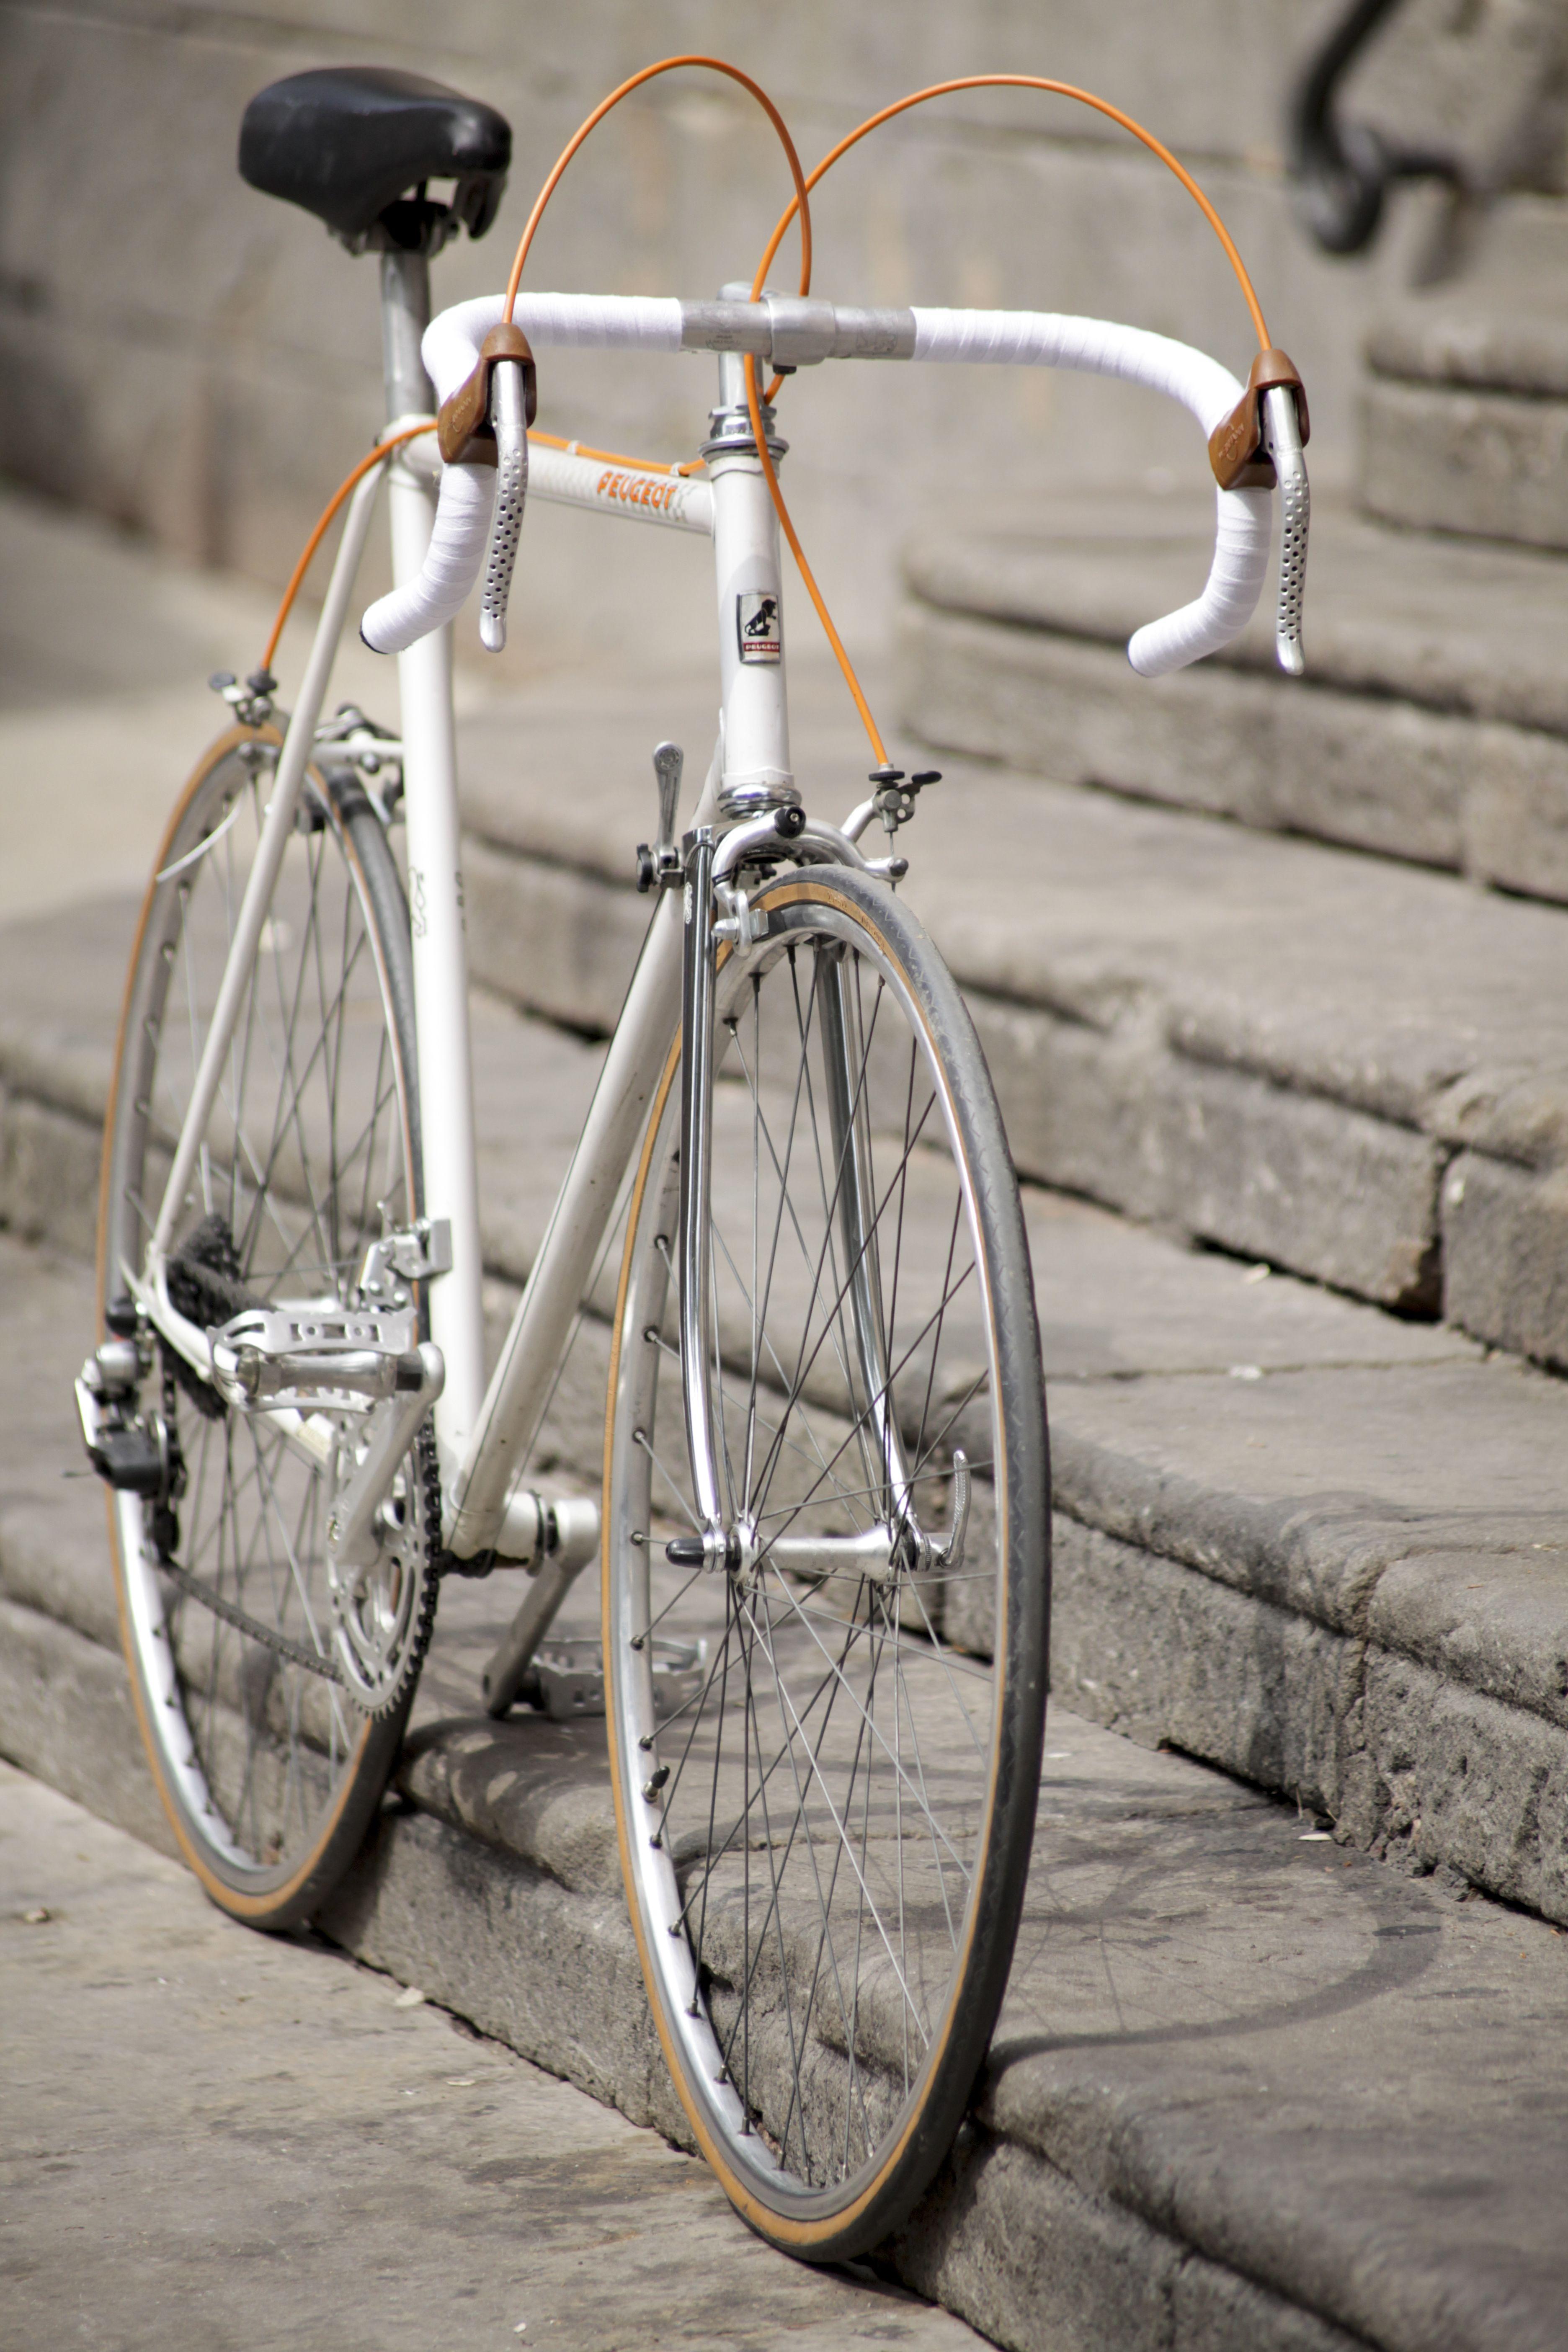 vintage bicycle peugeot pfn10 1983 fotos eva ruiz - sports et